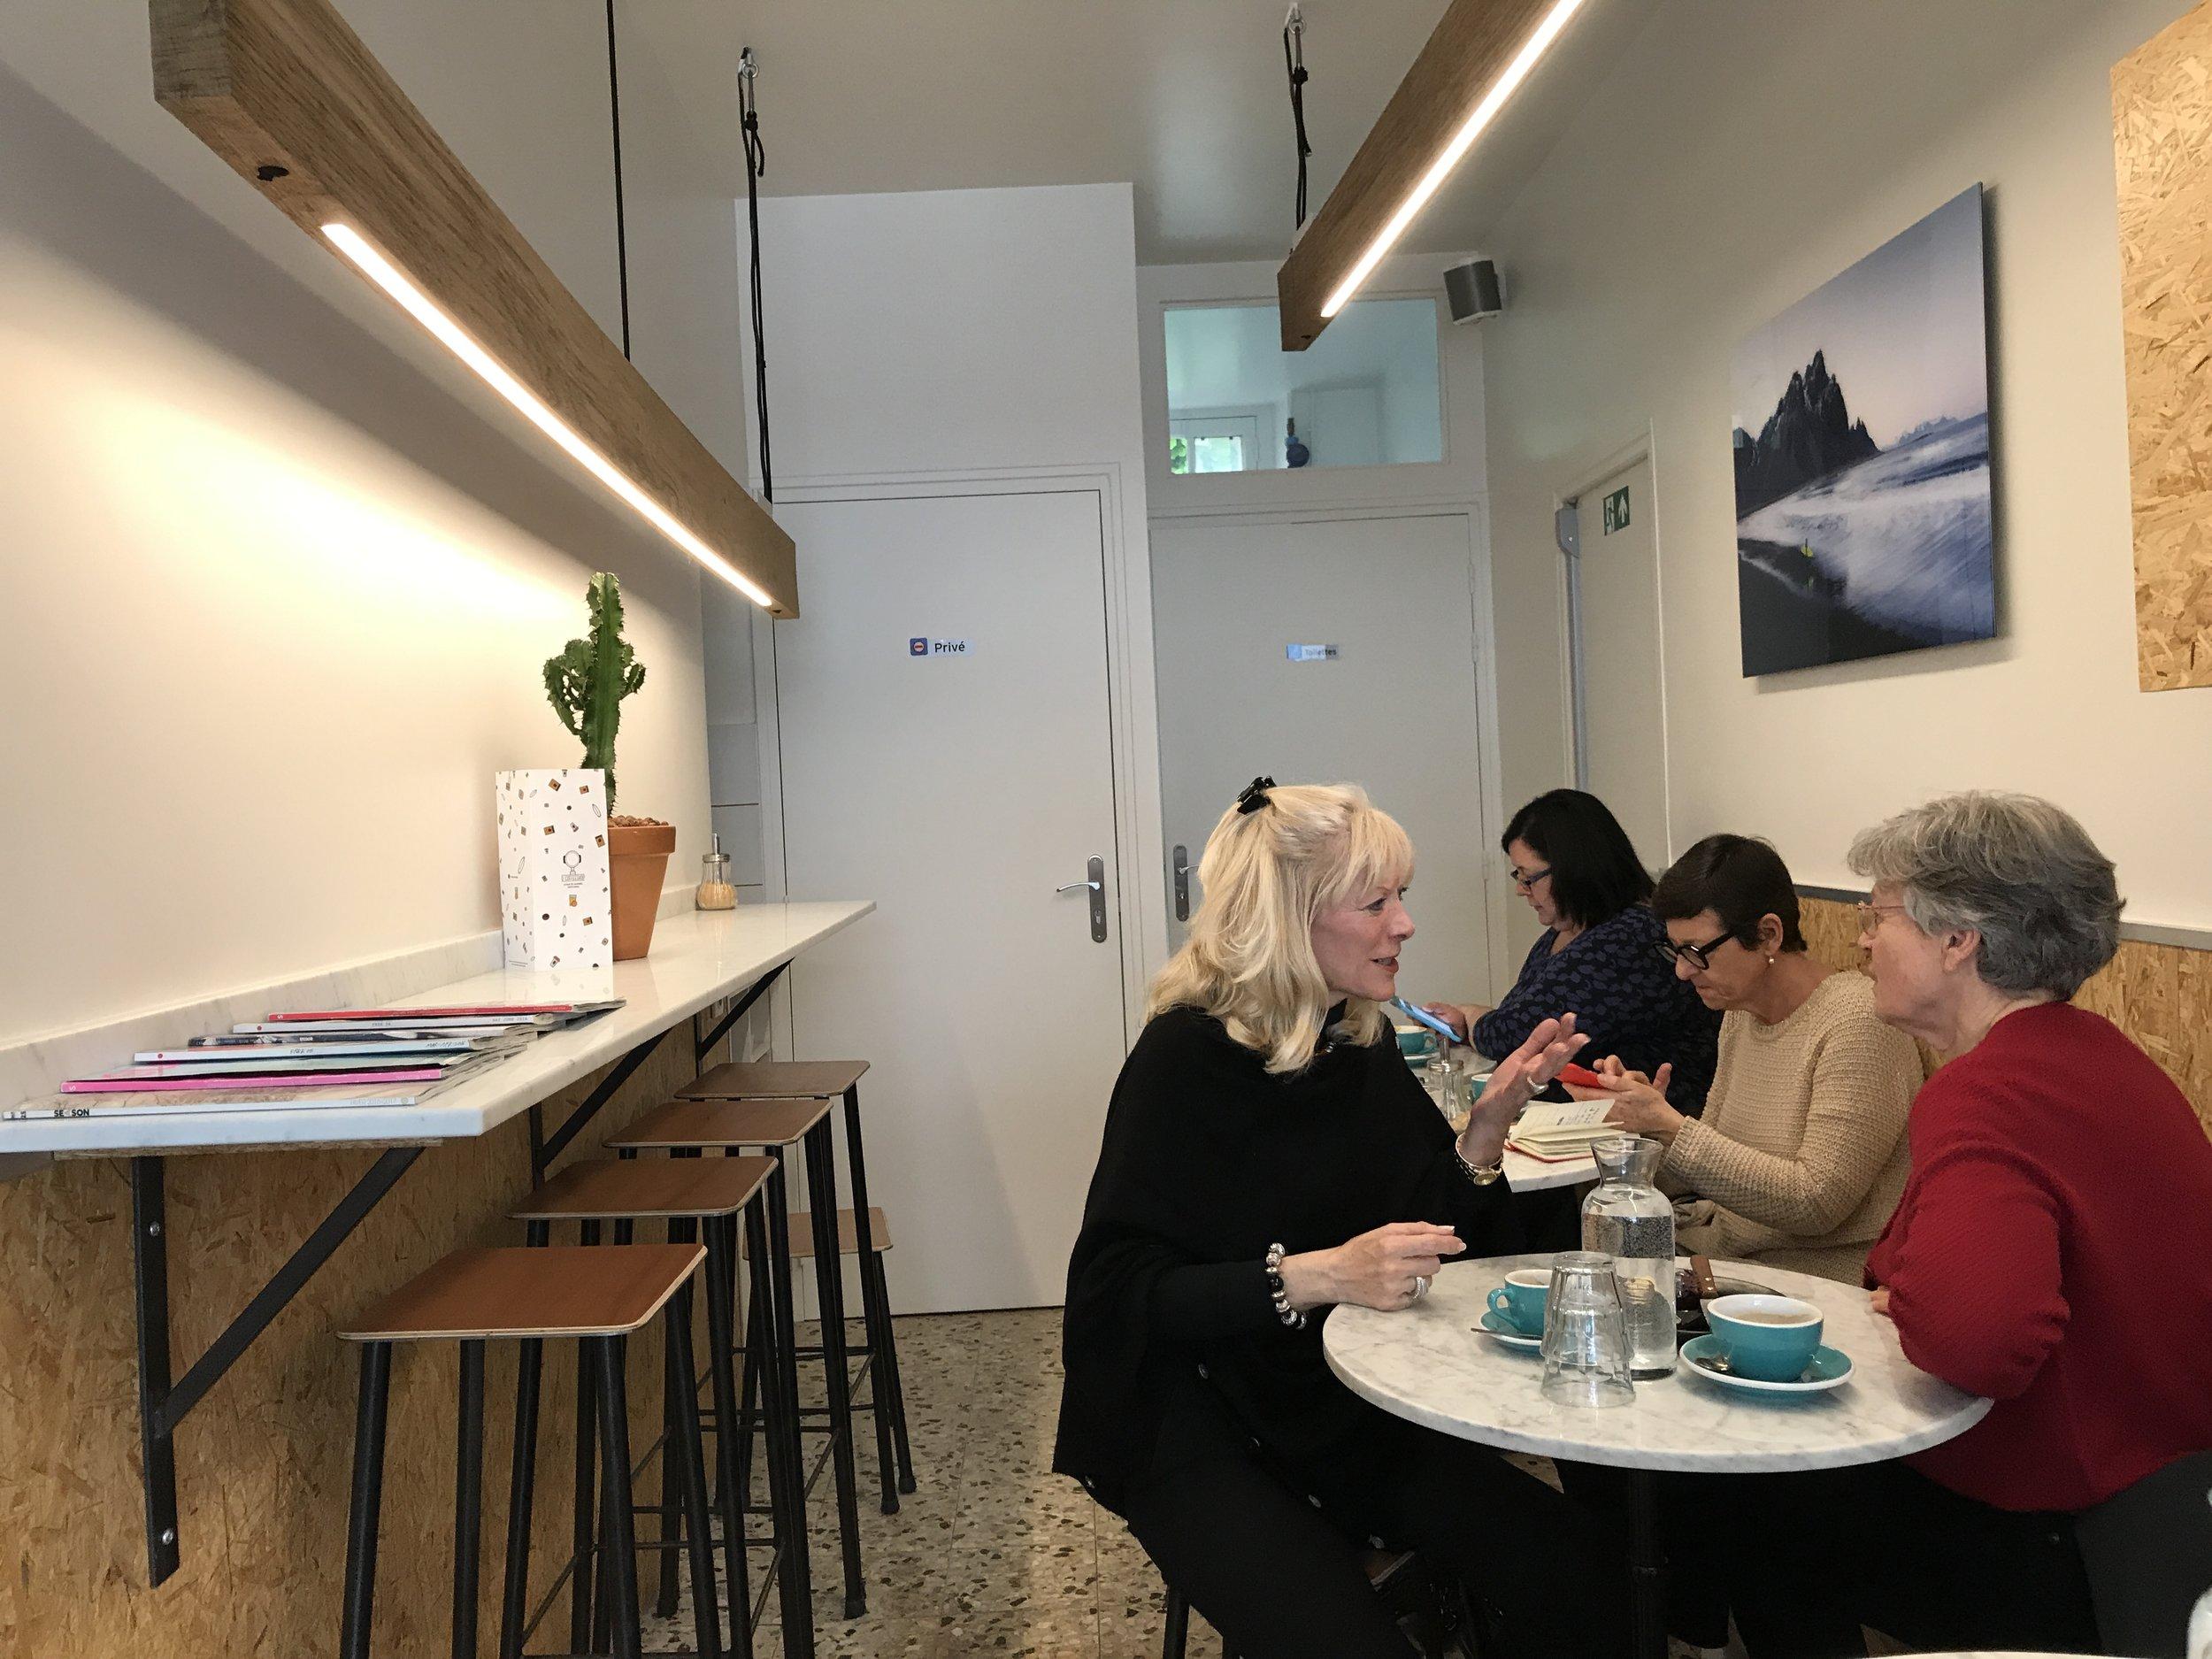 O Coffeeshop interior